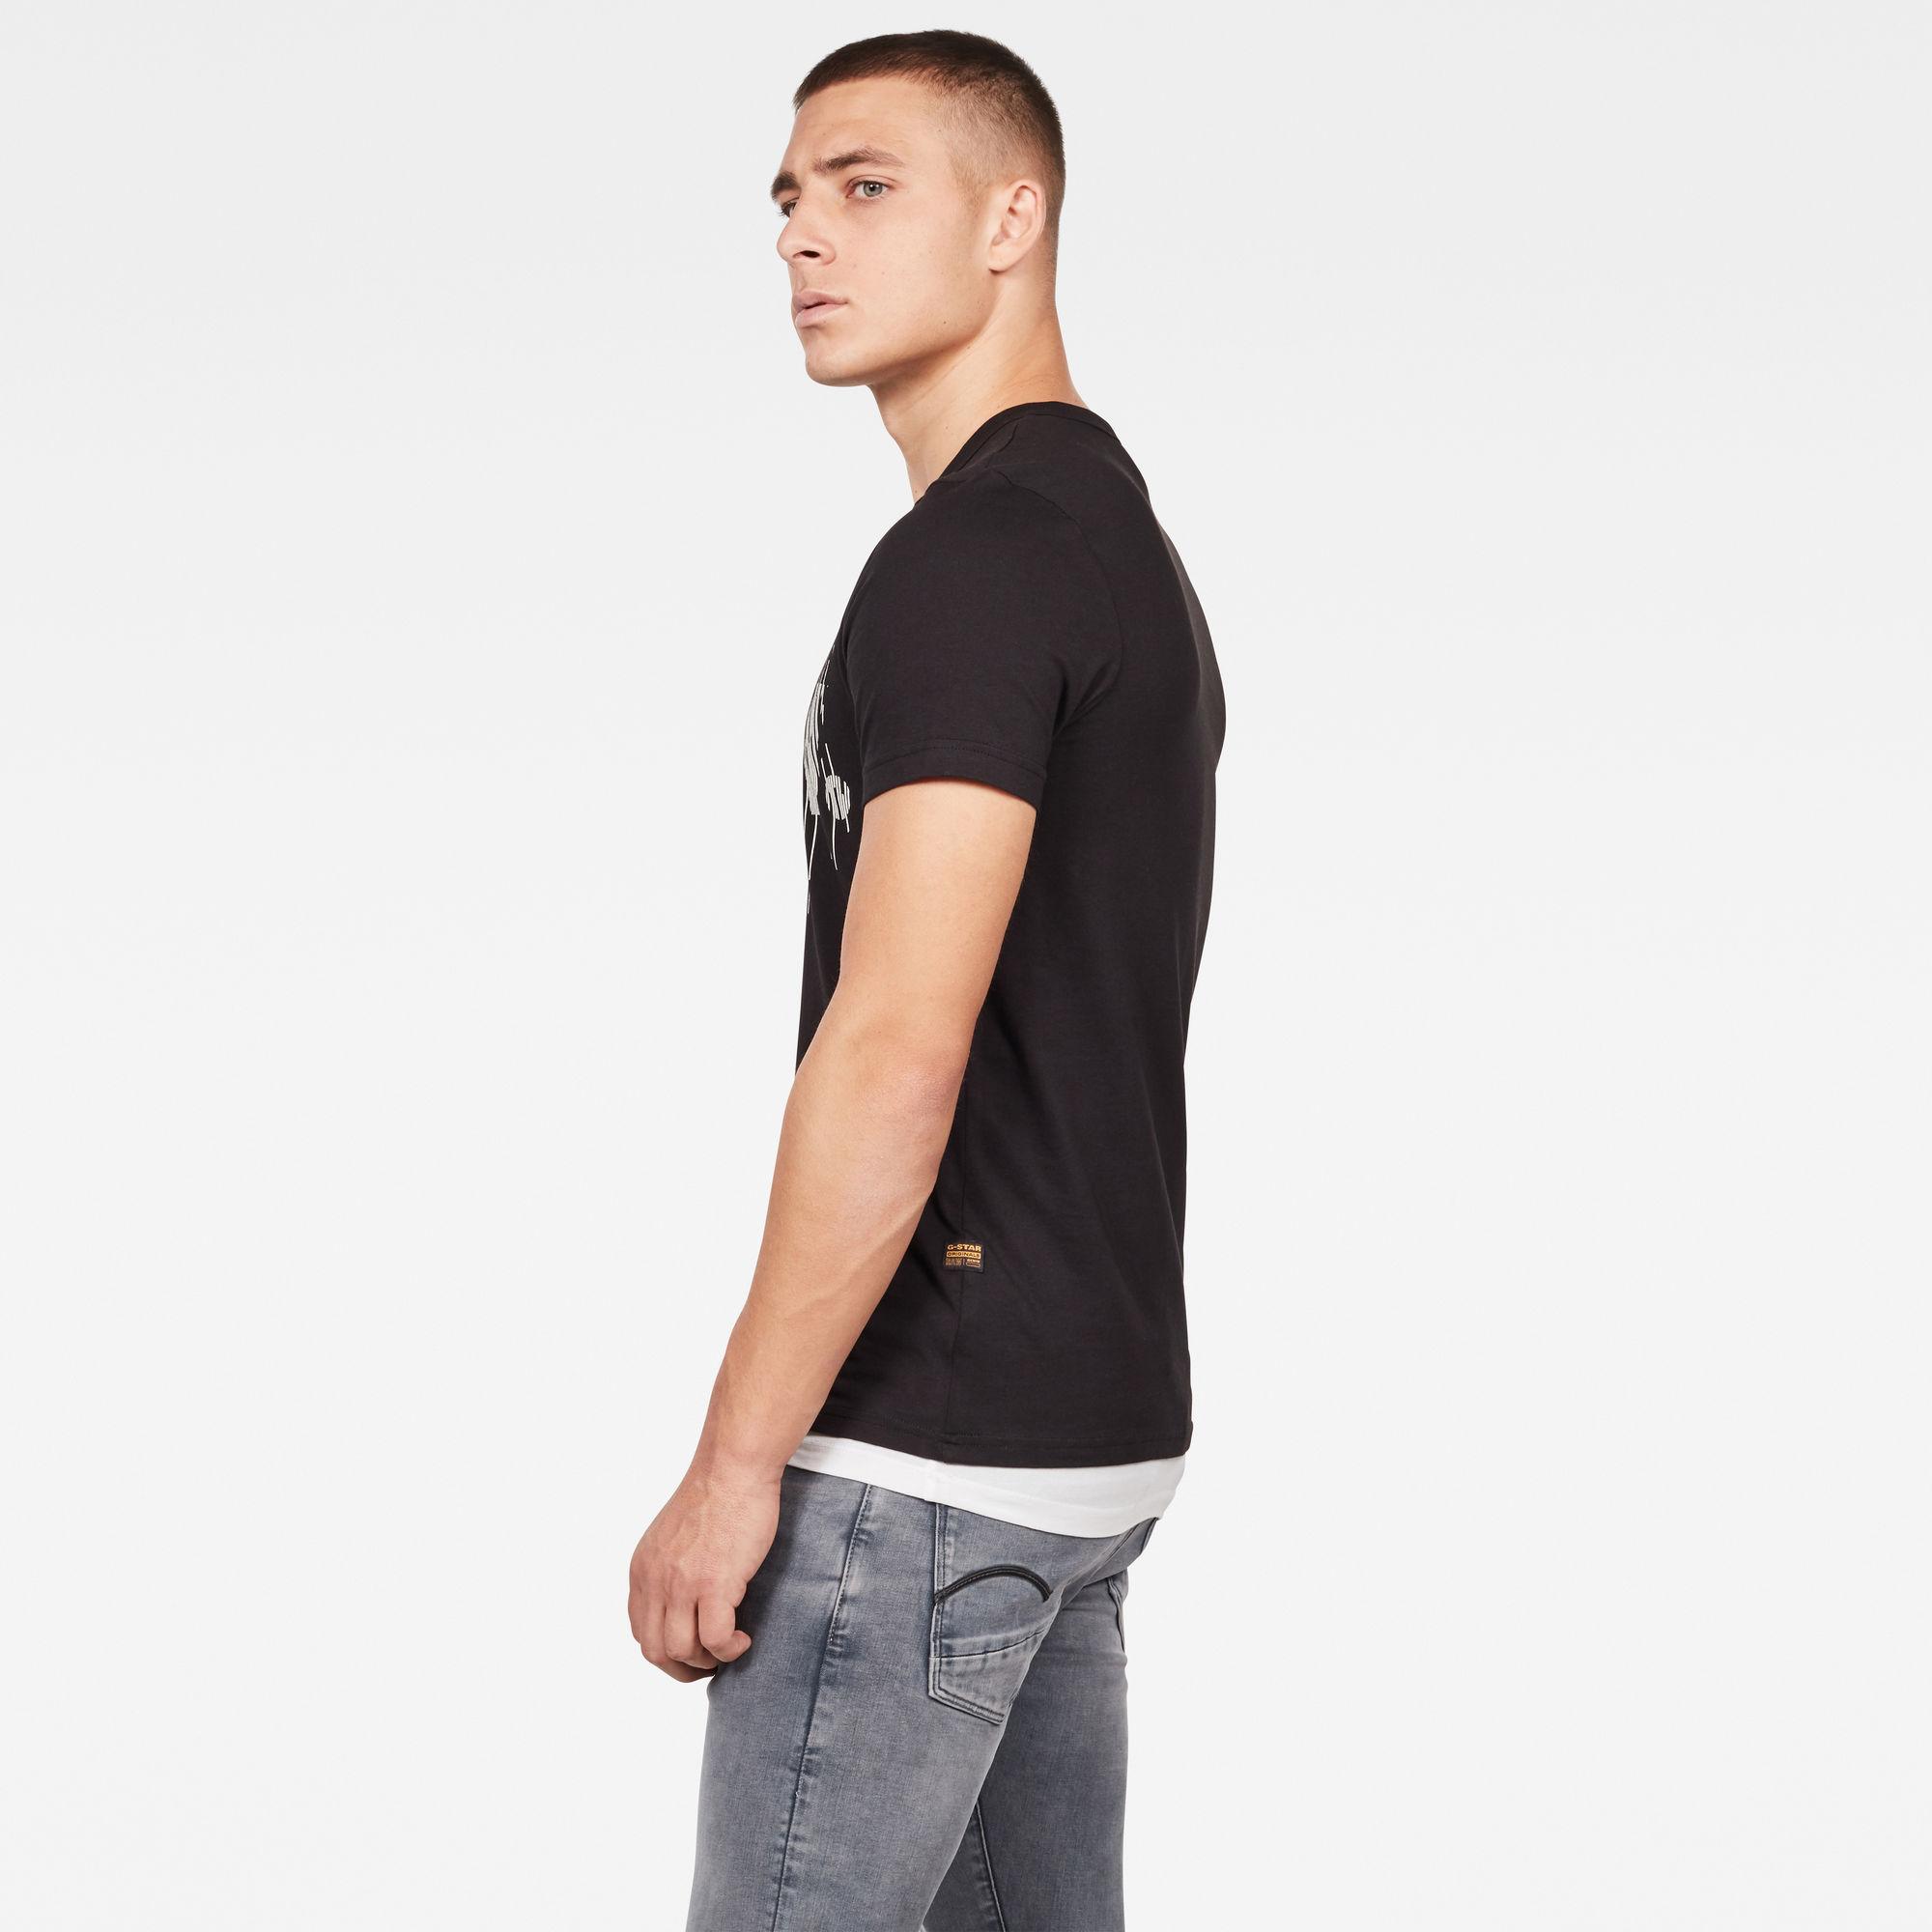 G-Star RAW Graphic 23 Slim T-Shirt